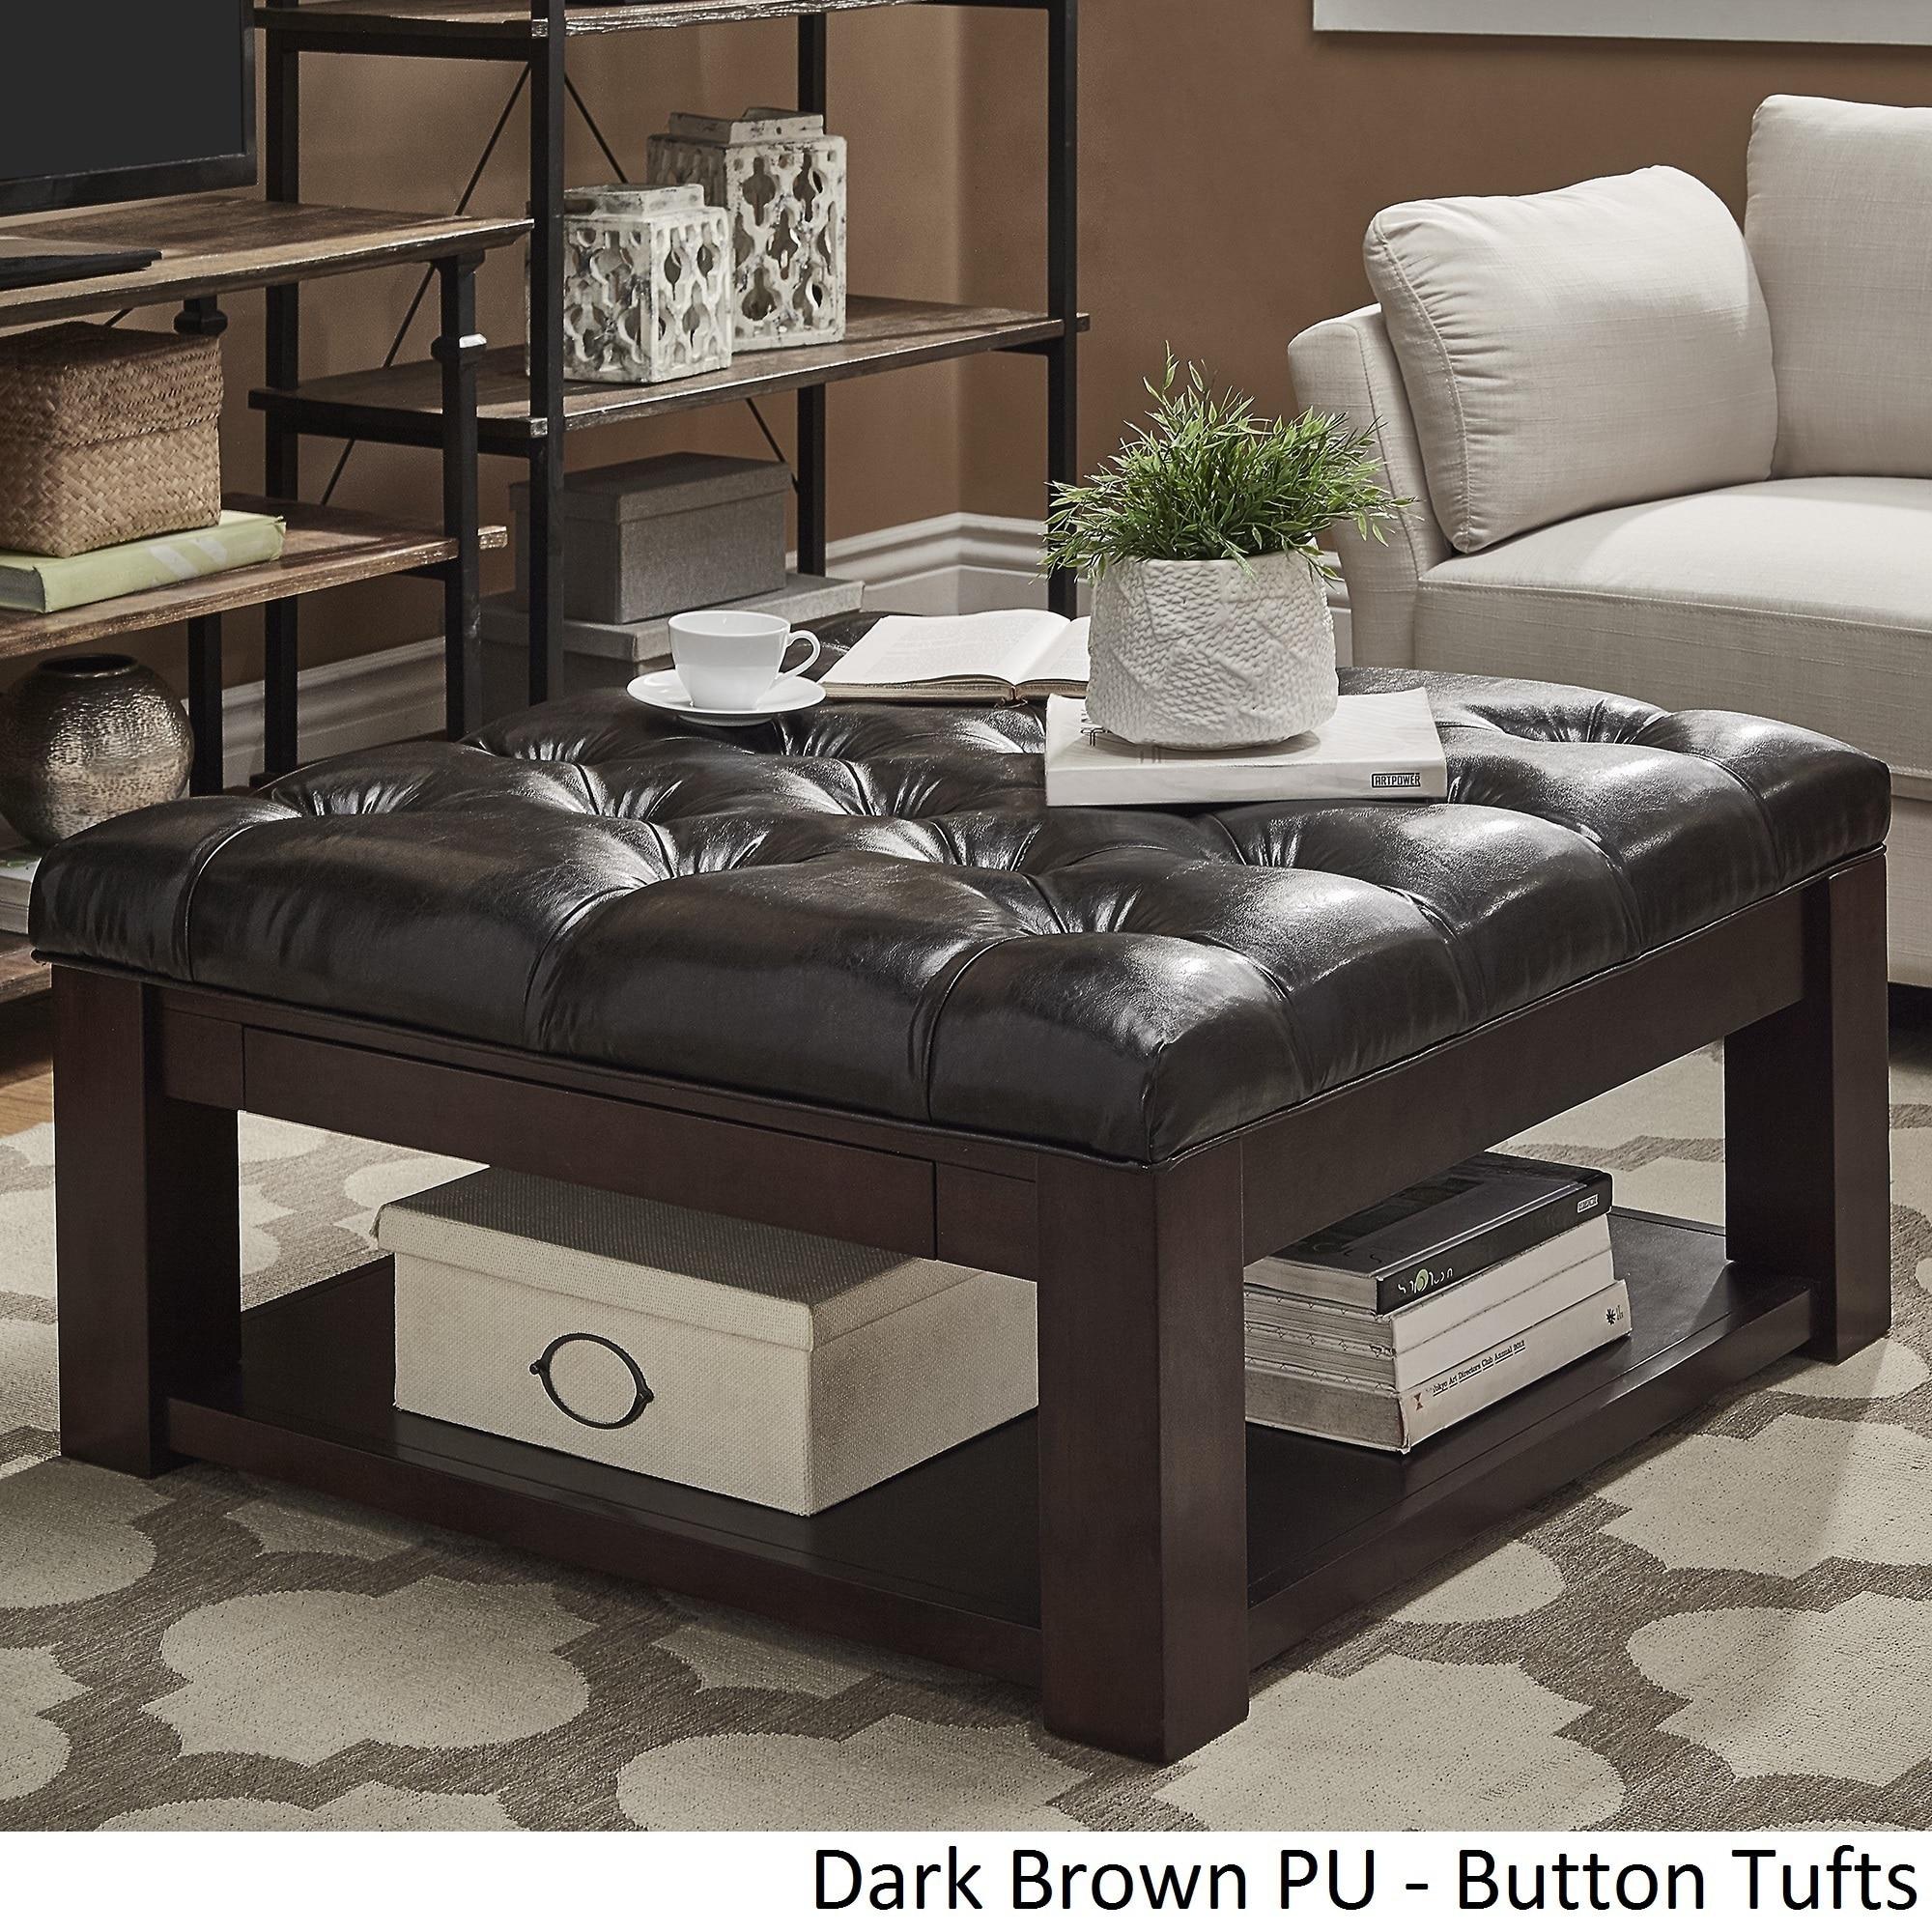 Lennon Espresso Square Storage Ottoman Coffee Table By Inspire Q Clic Dark Brown Pu On Tufts